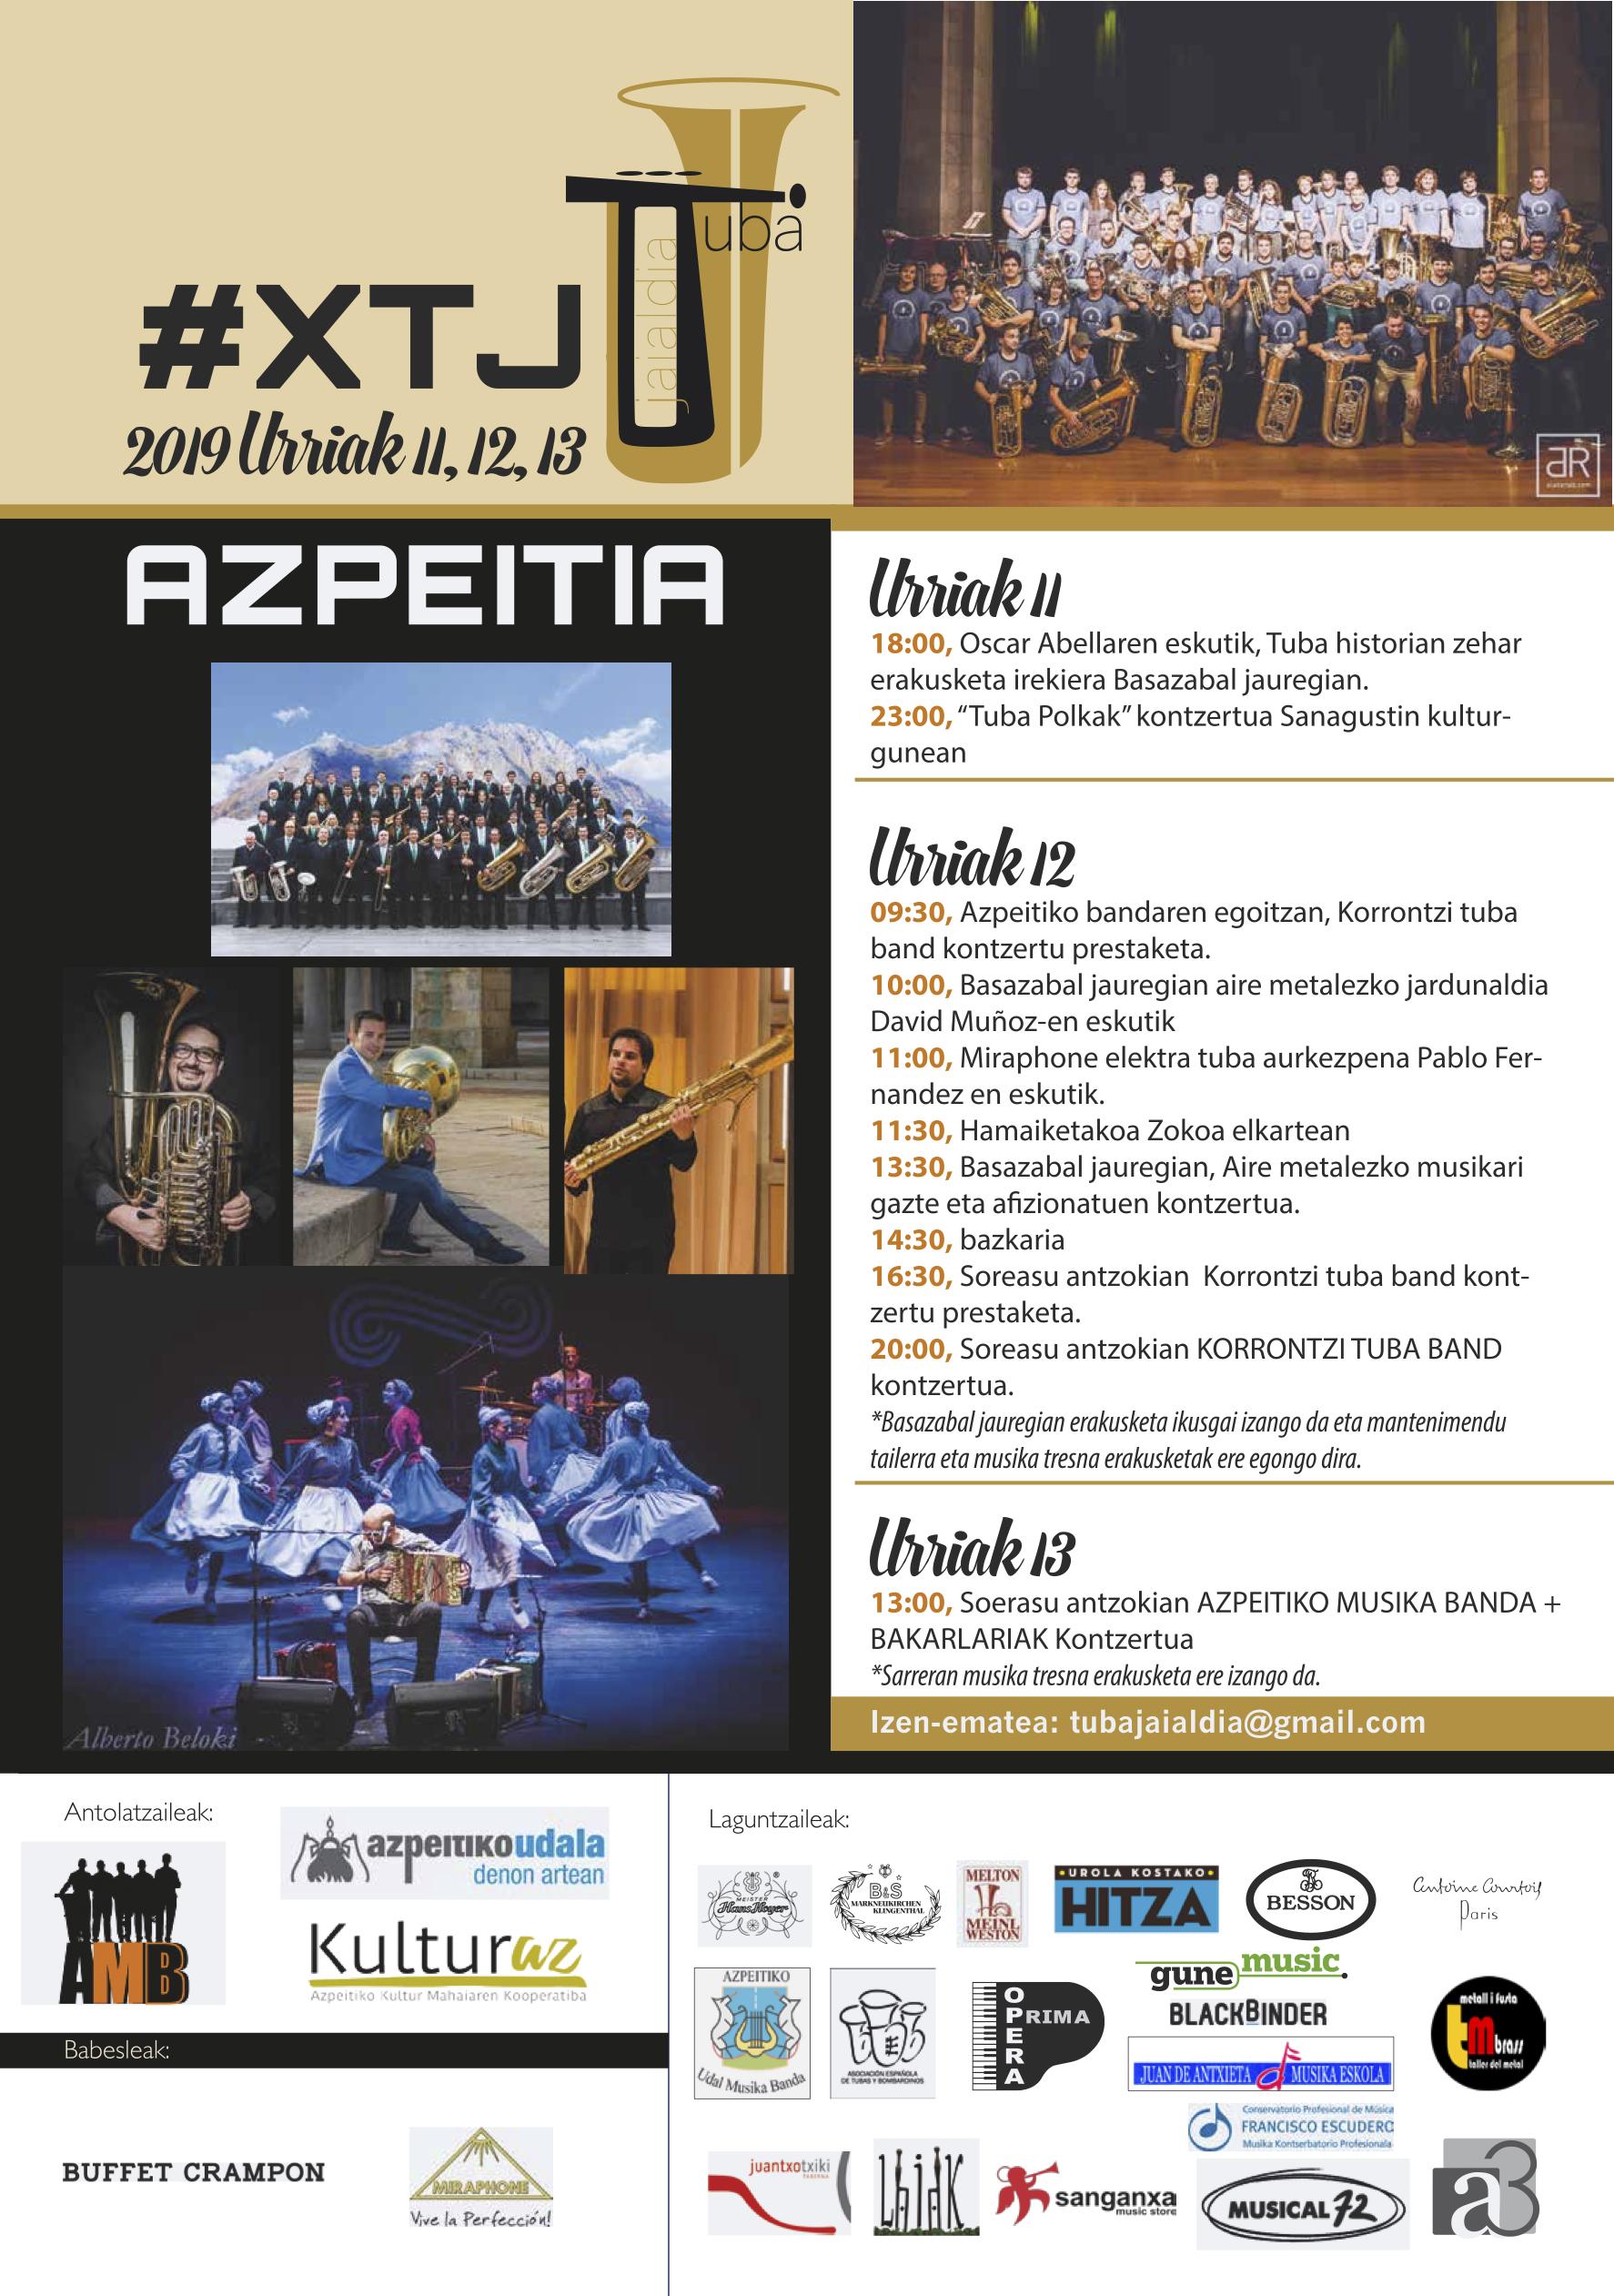 Azpeitiko Udal Musika Banda + Bakarlariak